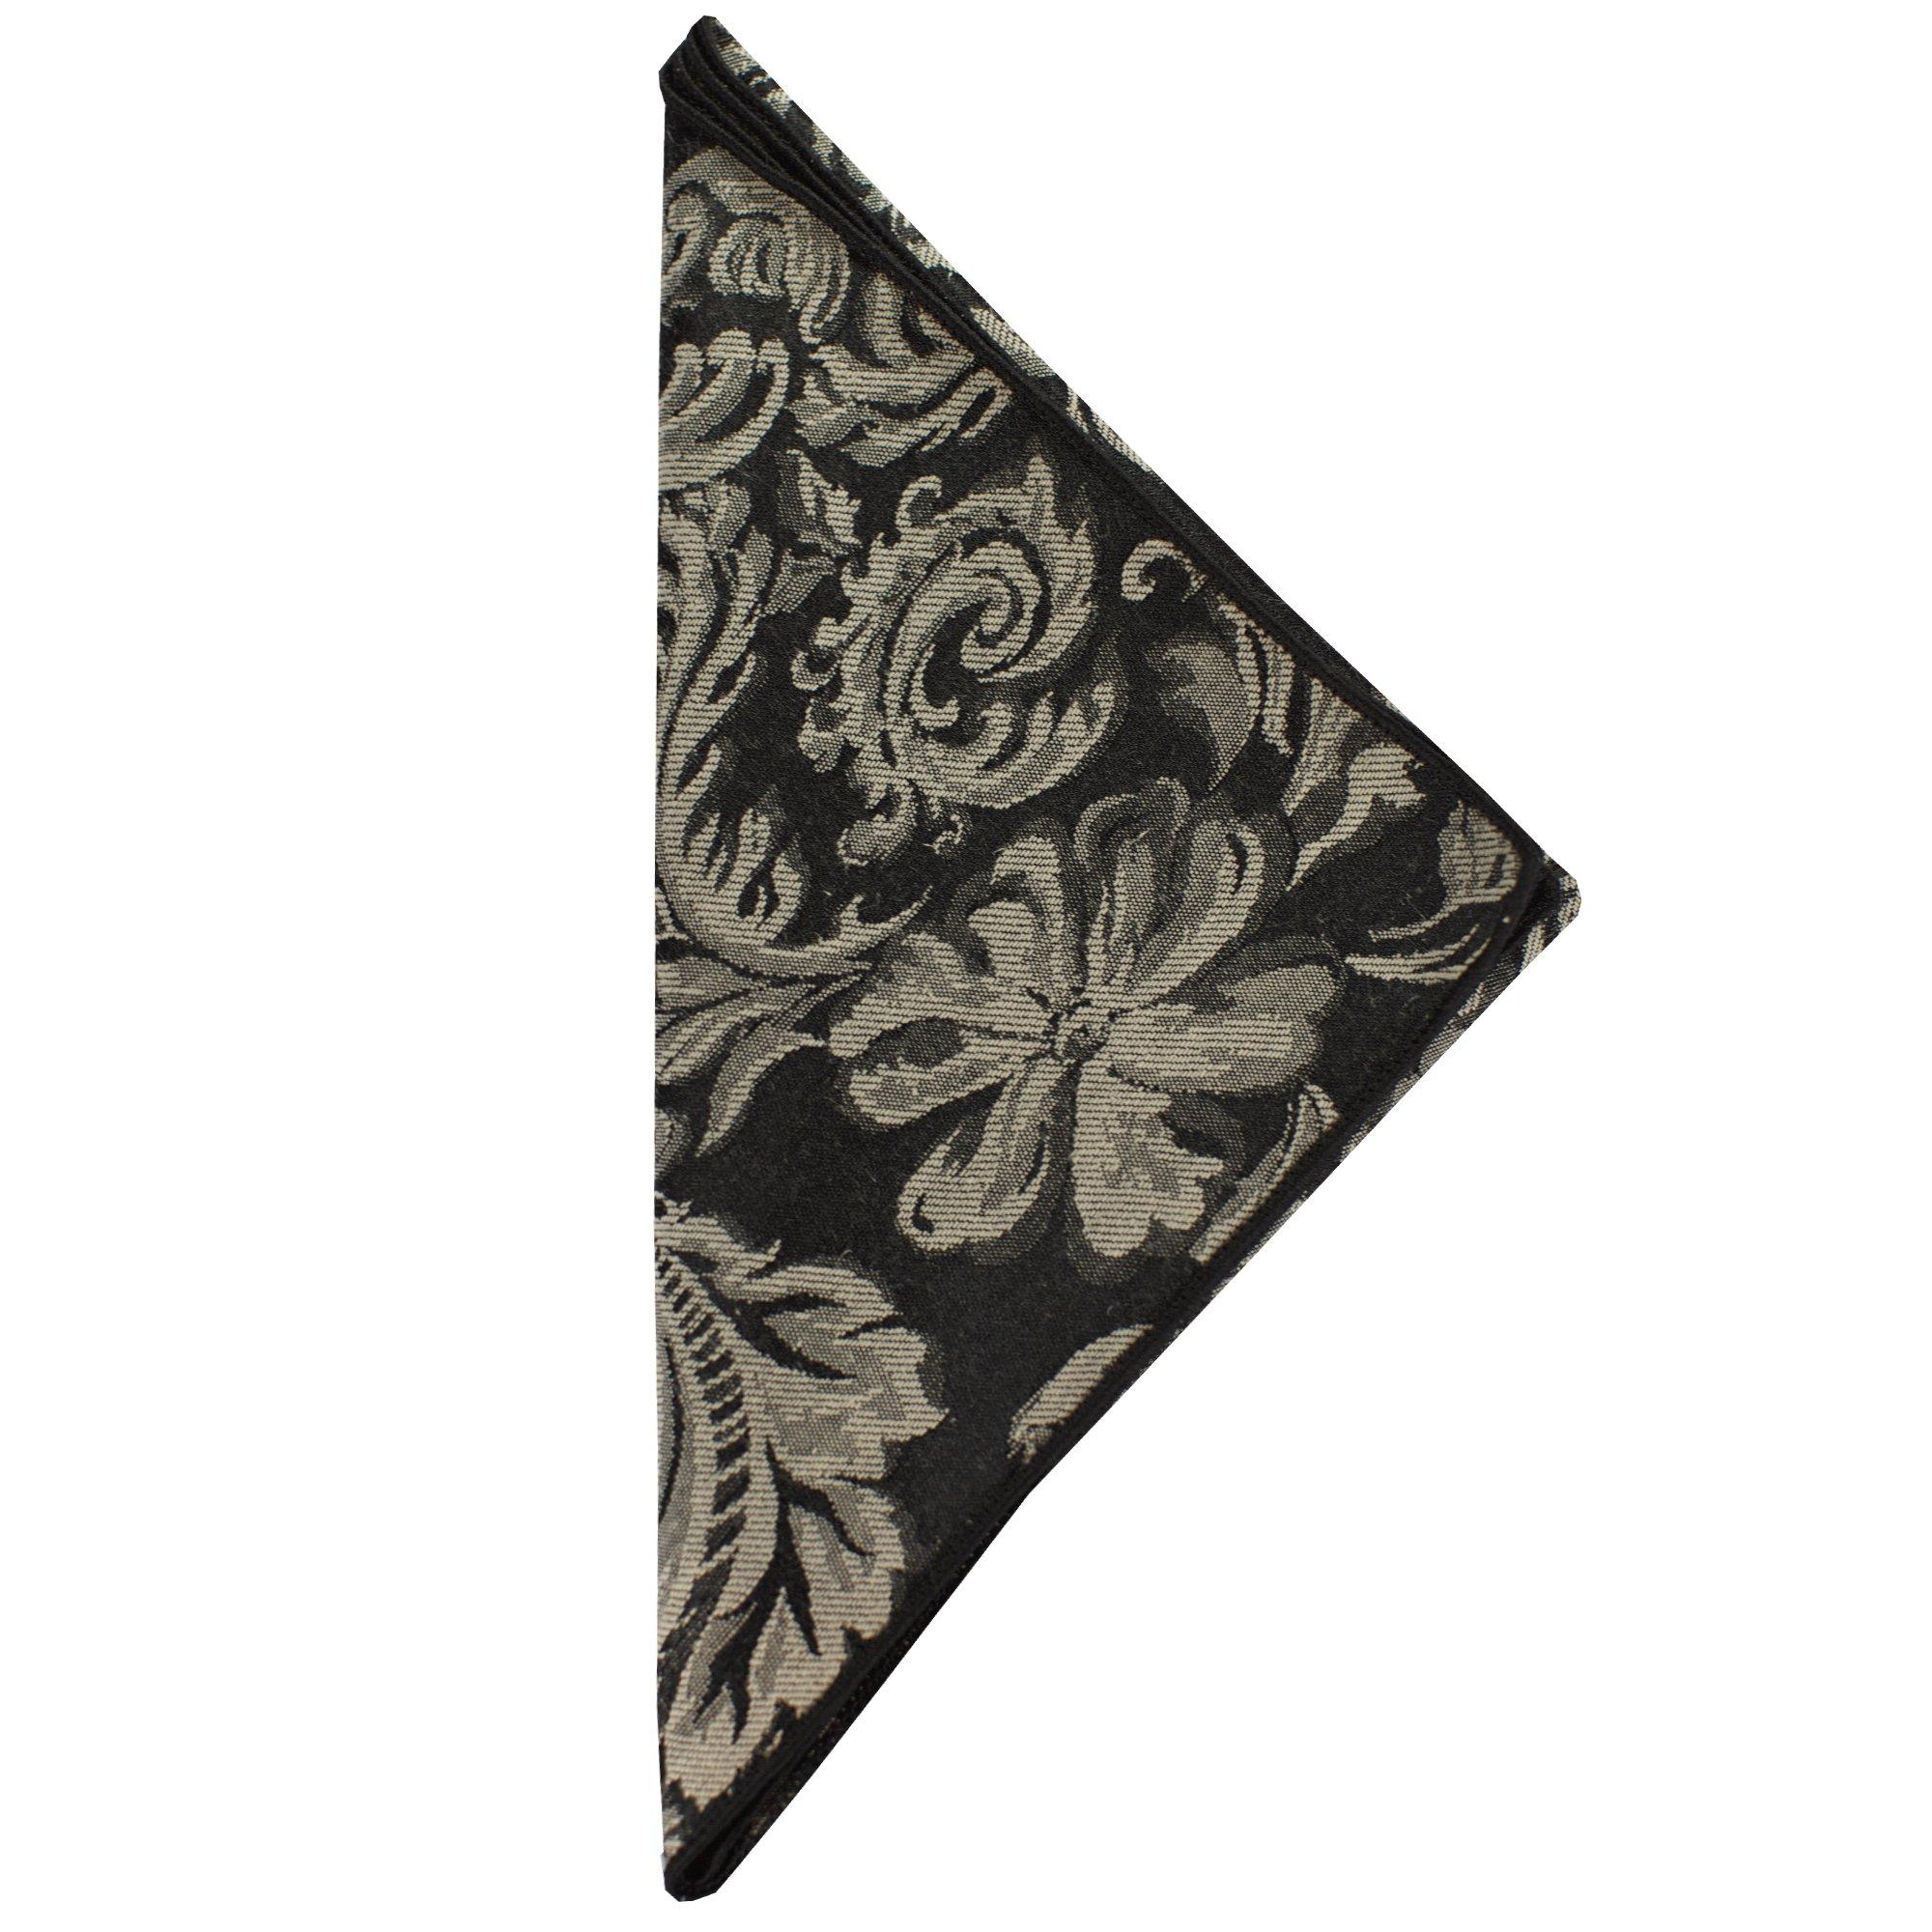 Ultimate Textile (10 Dozen) Miranda 17 x 17-Inch Damask Cloth Napkins- Jacquard Weave, Black